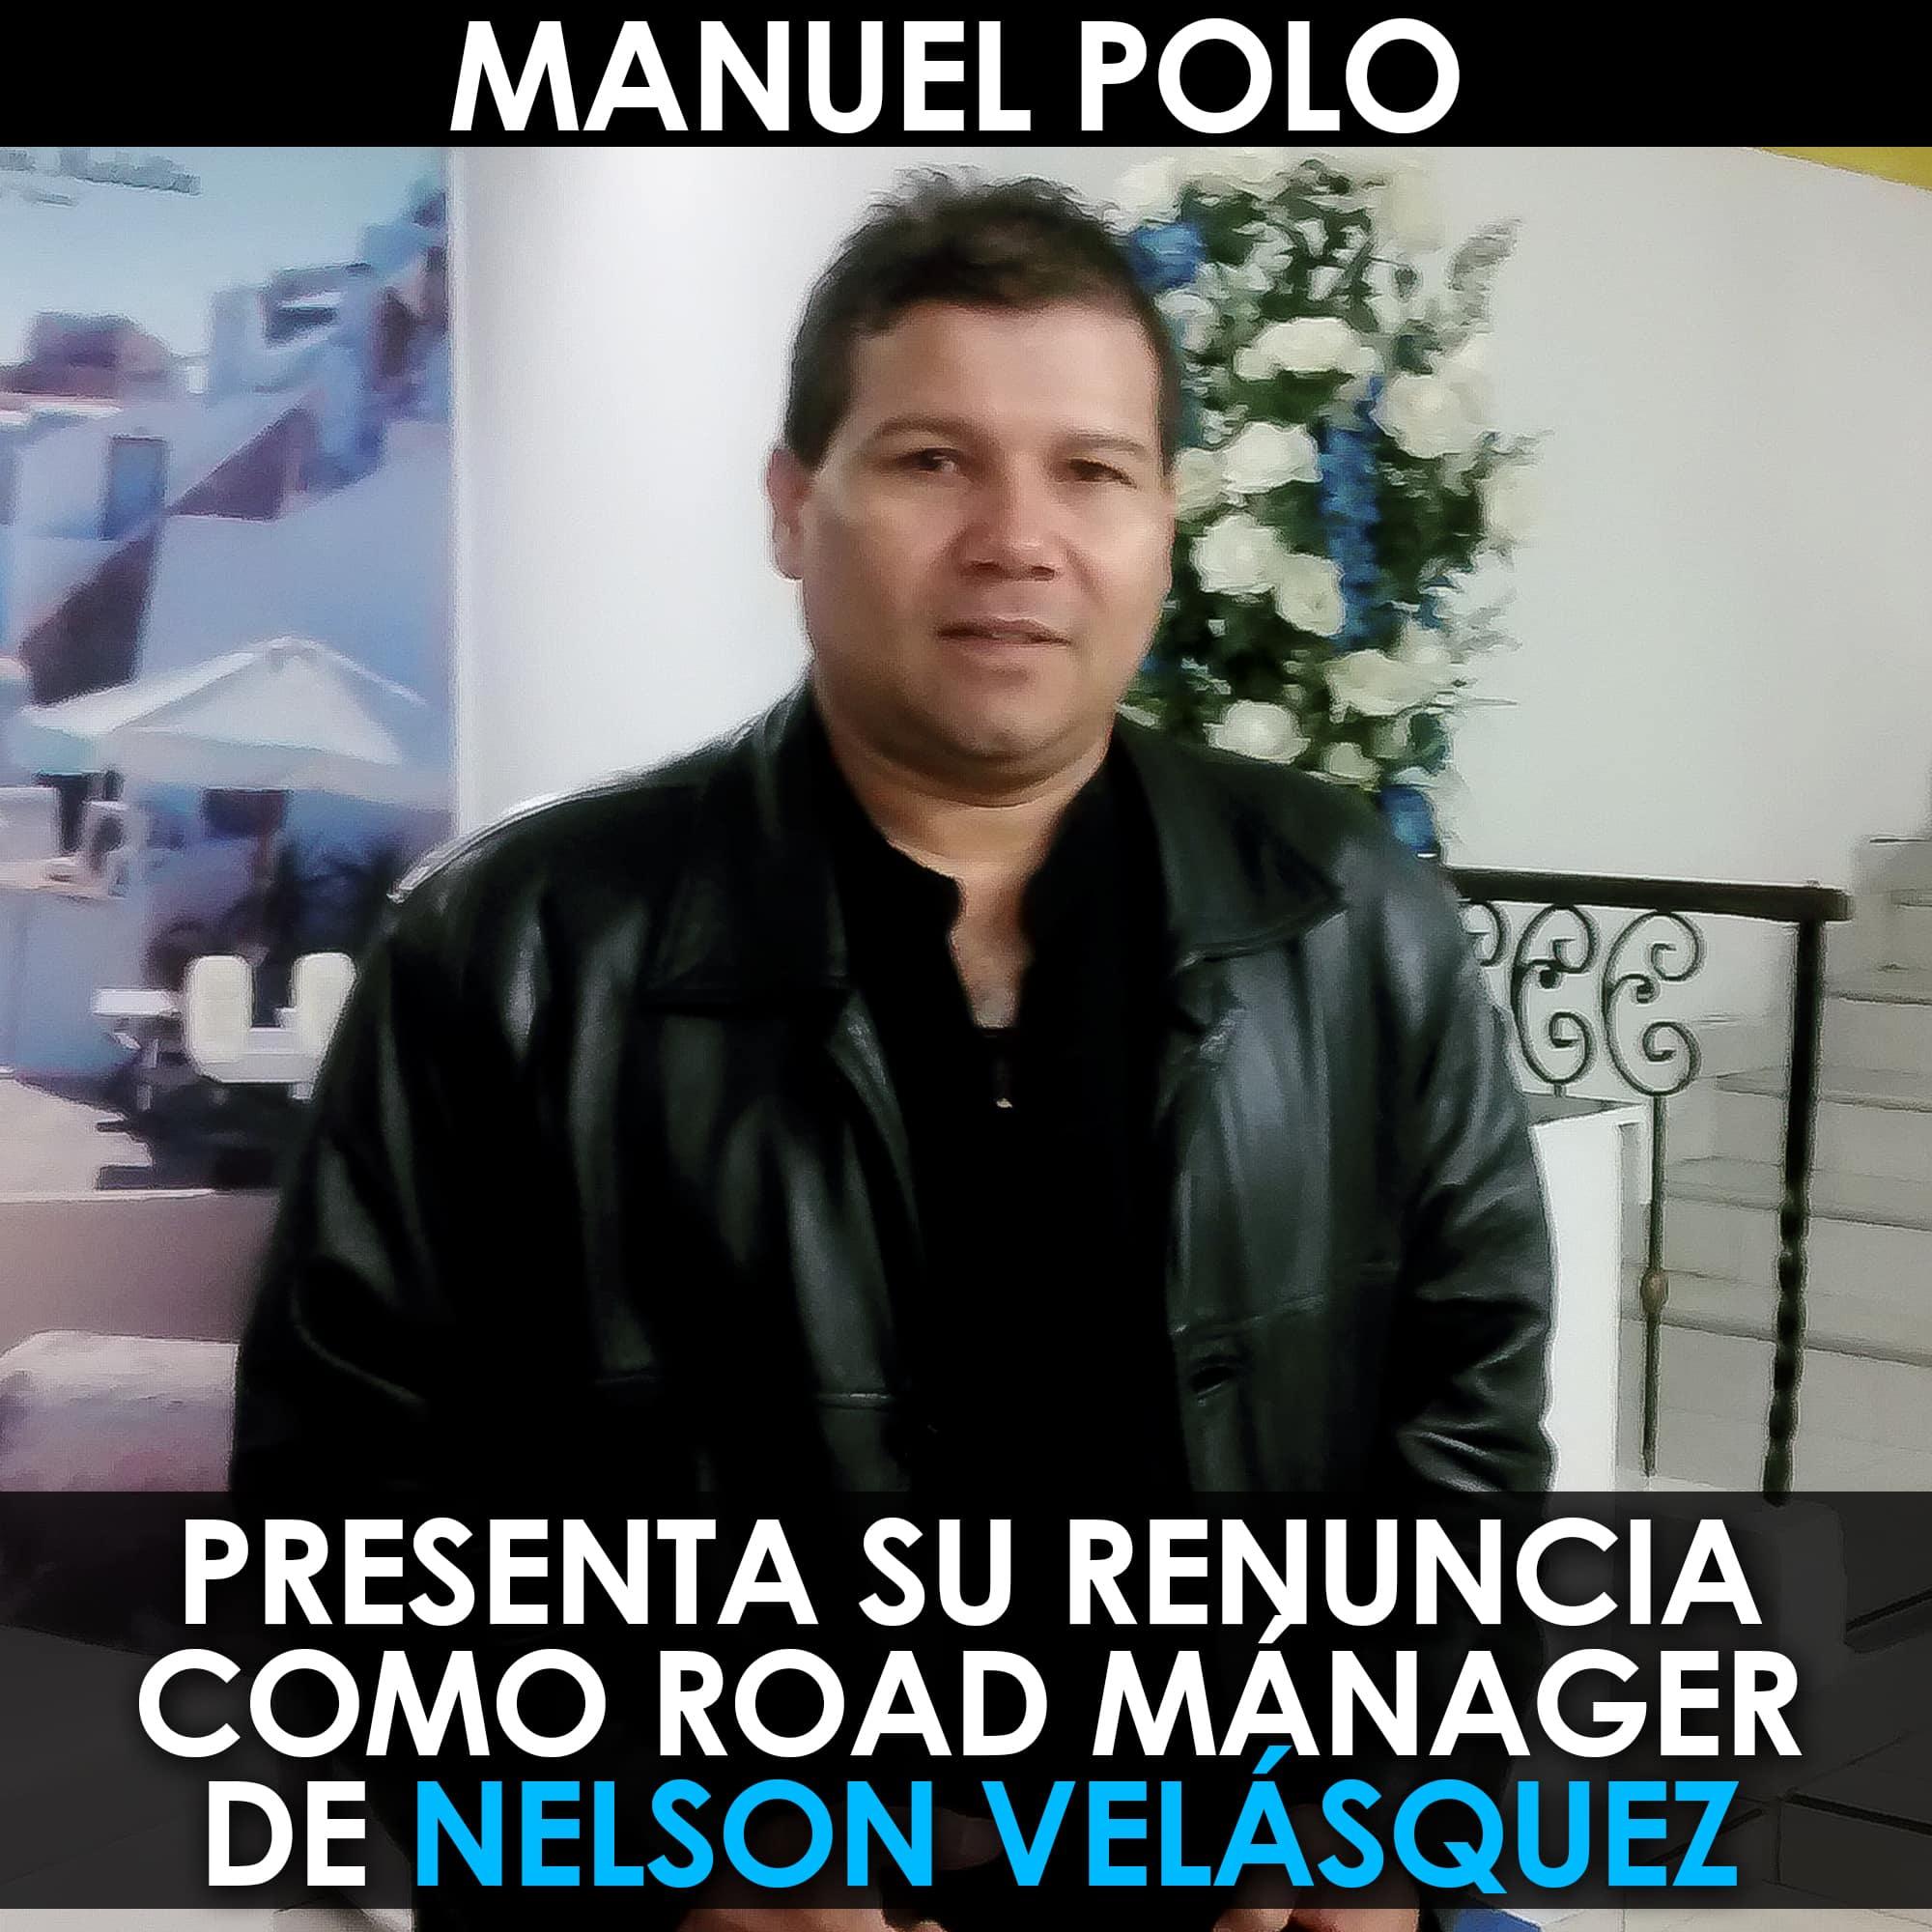 Manuel Polo renuncia. av